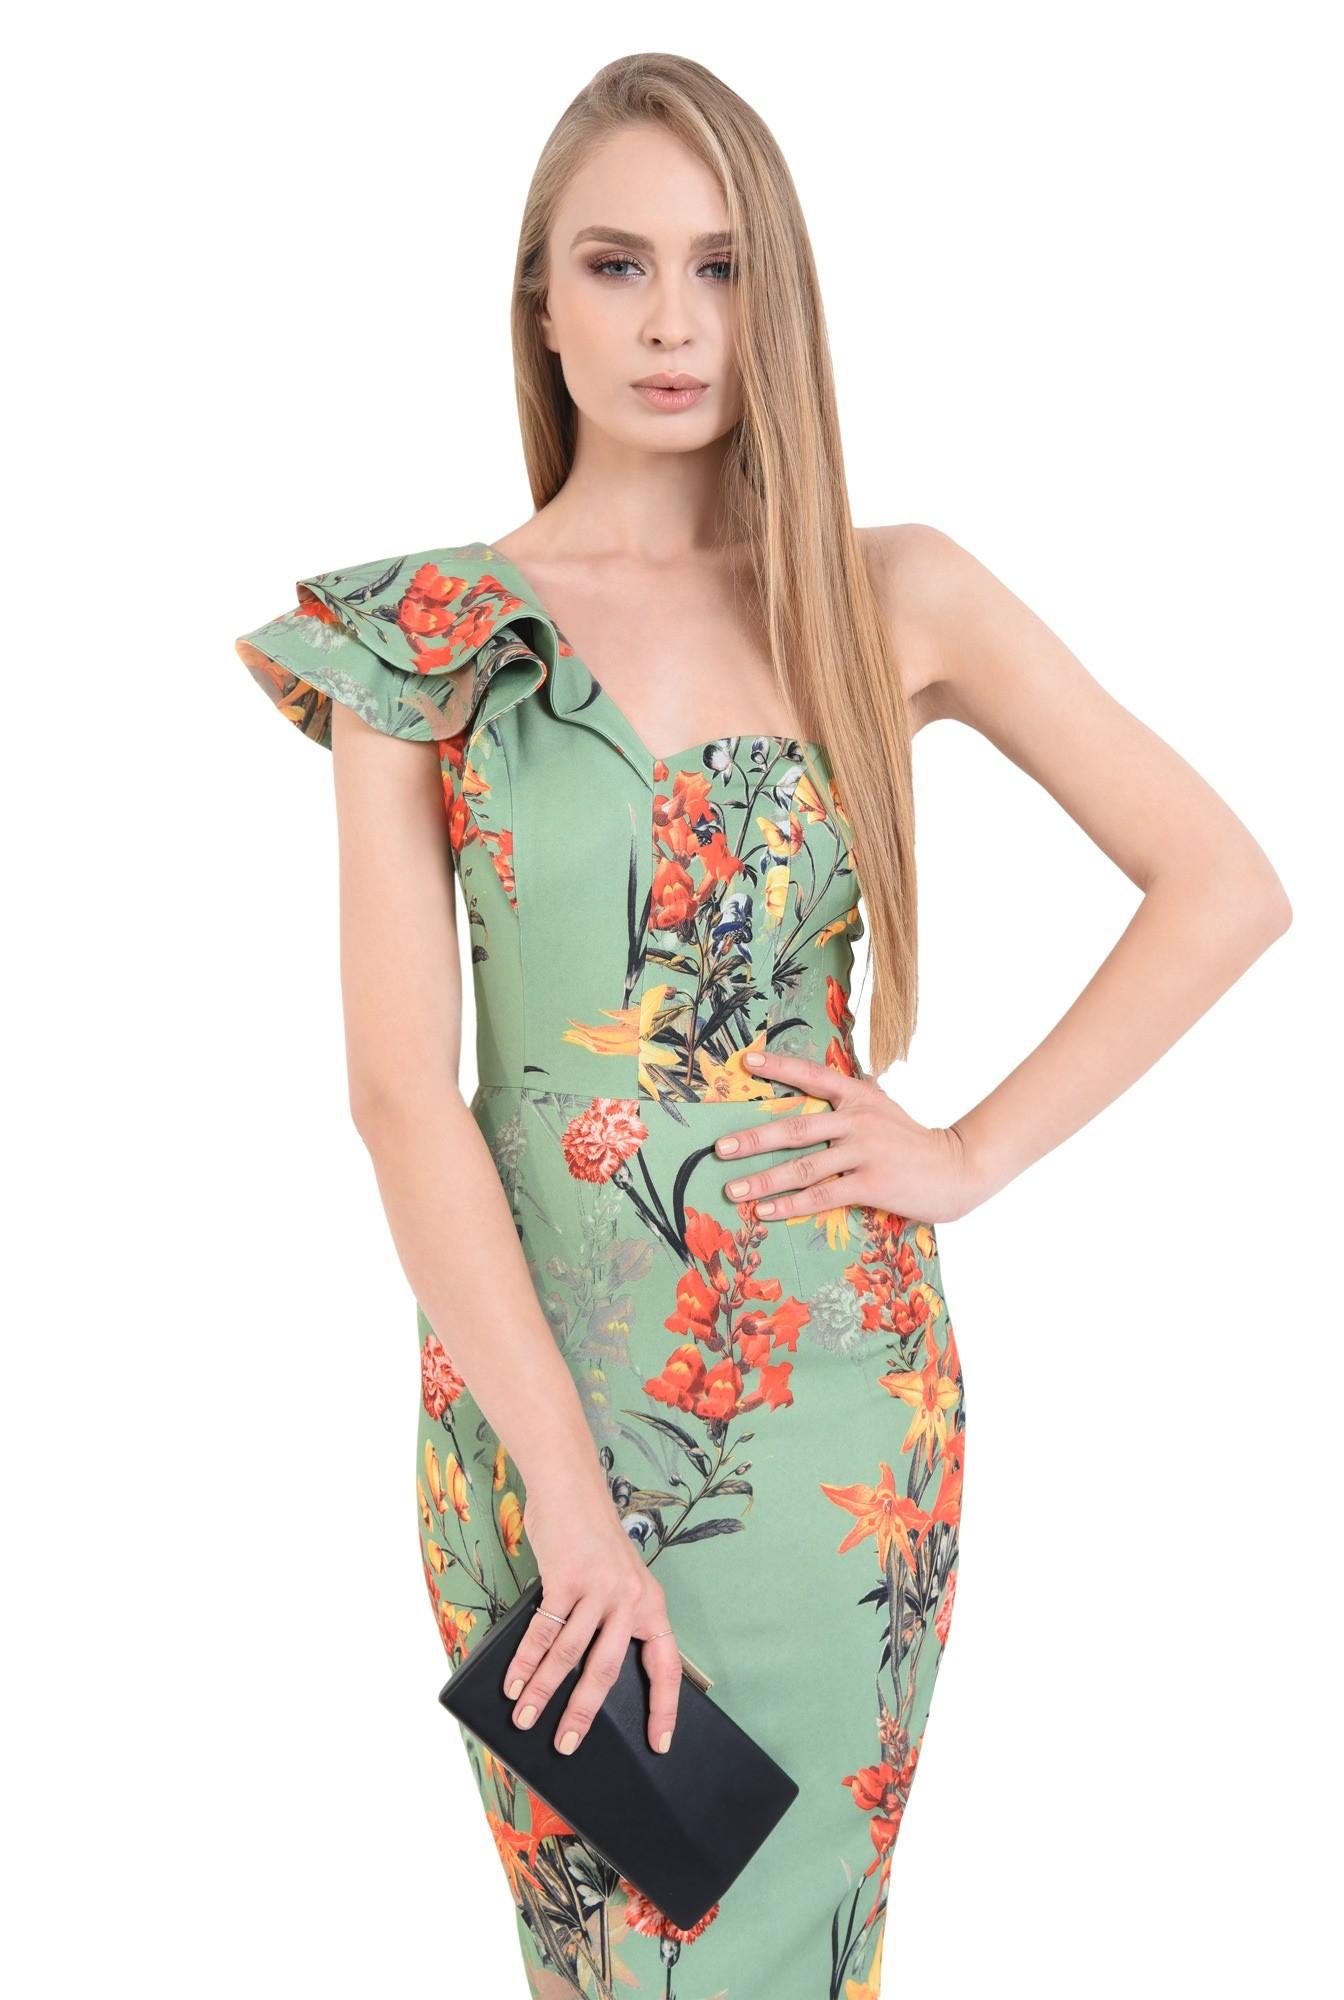 0 - rochie de ocazie, imprimeu floral, midi